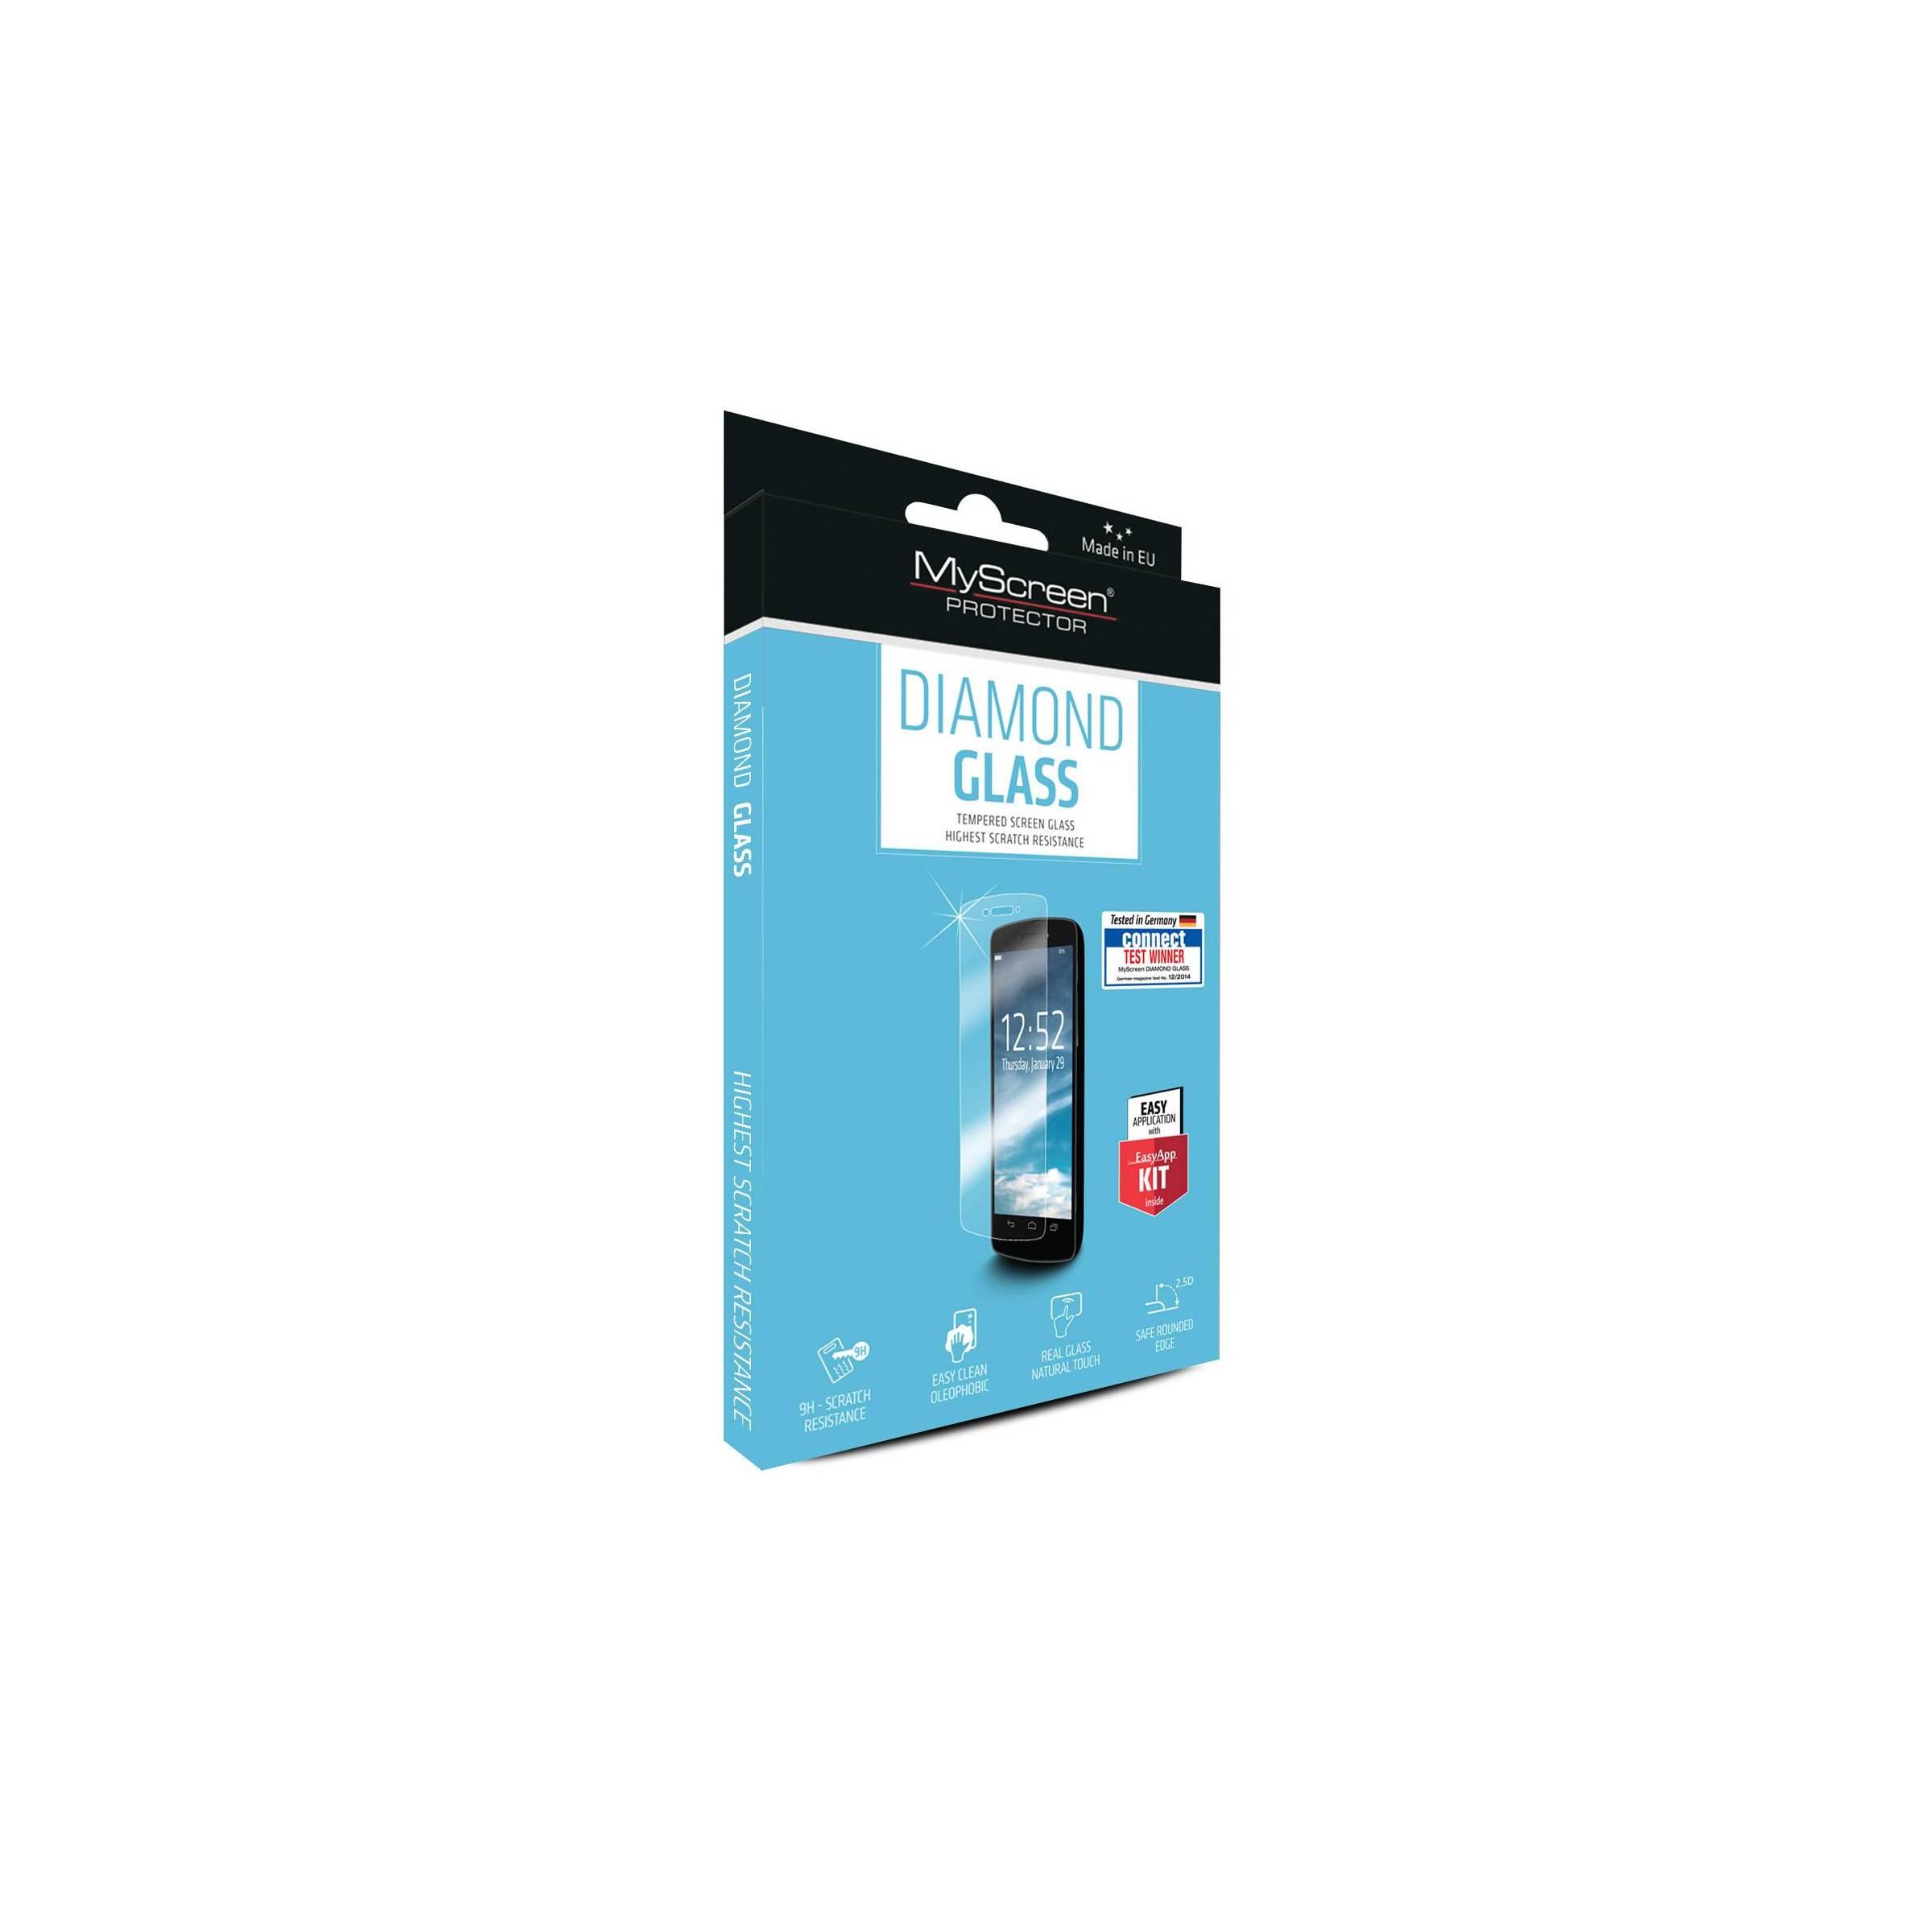 myscreen Myscreen diamond iphone 7/8 beskyttelsesglas på mackabler.dk